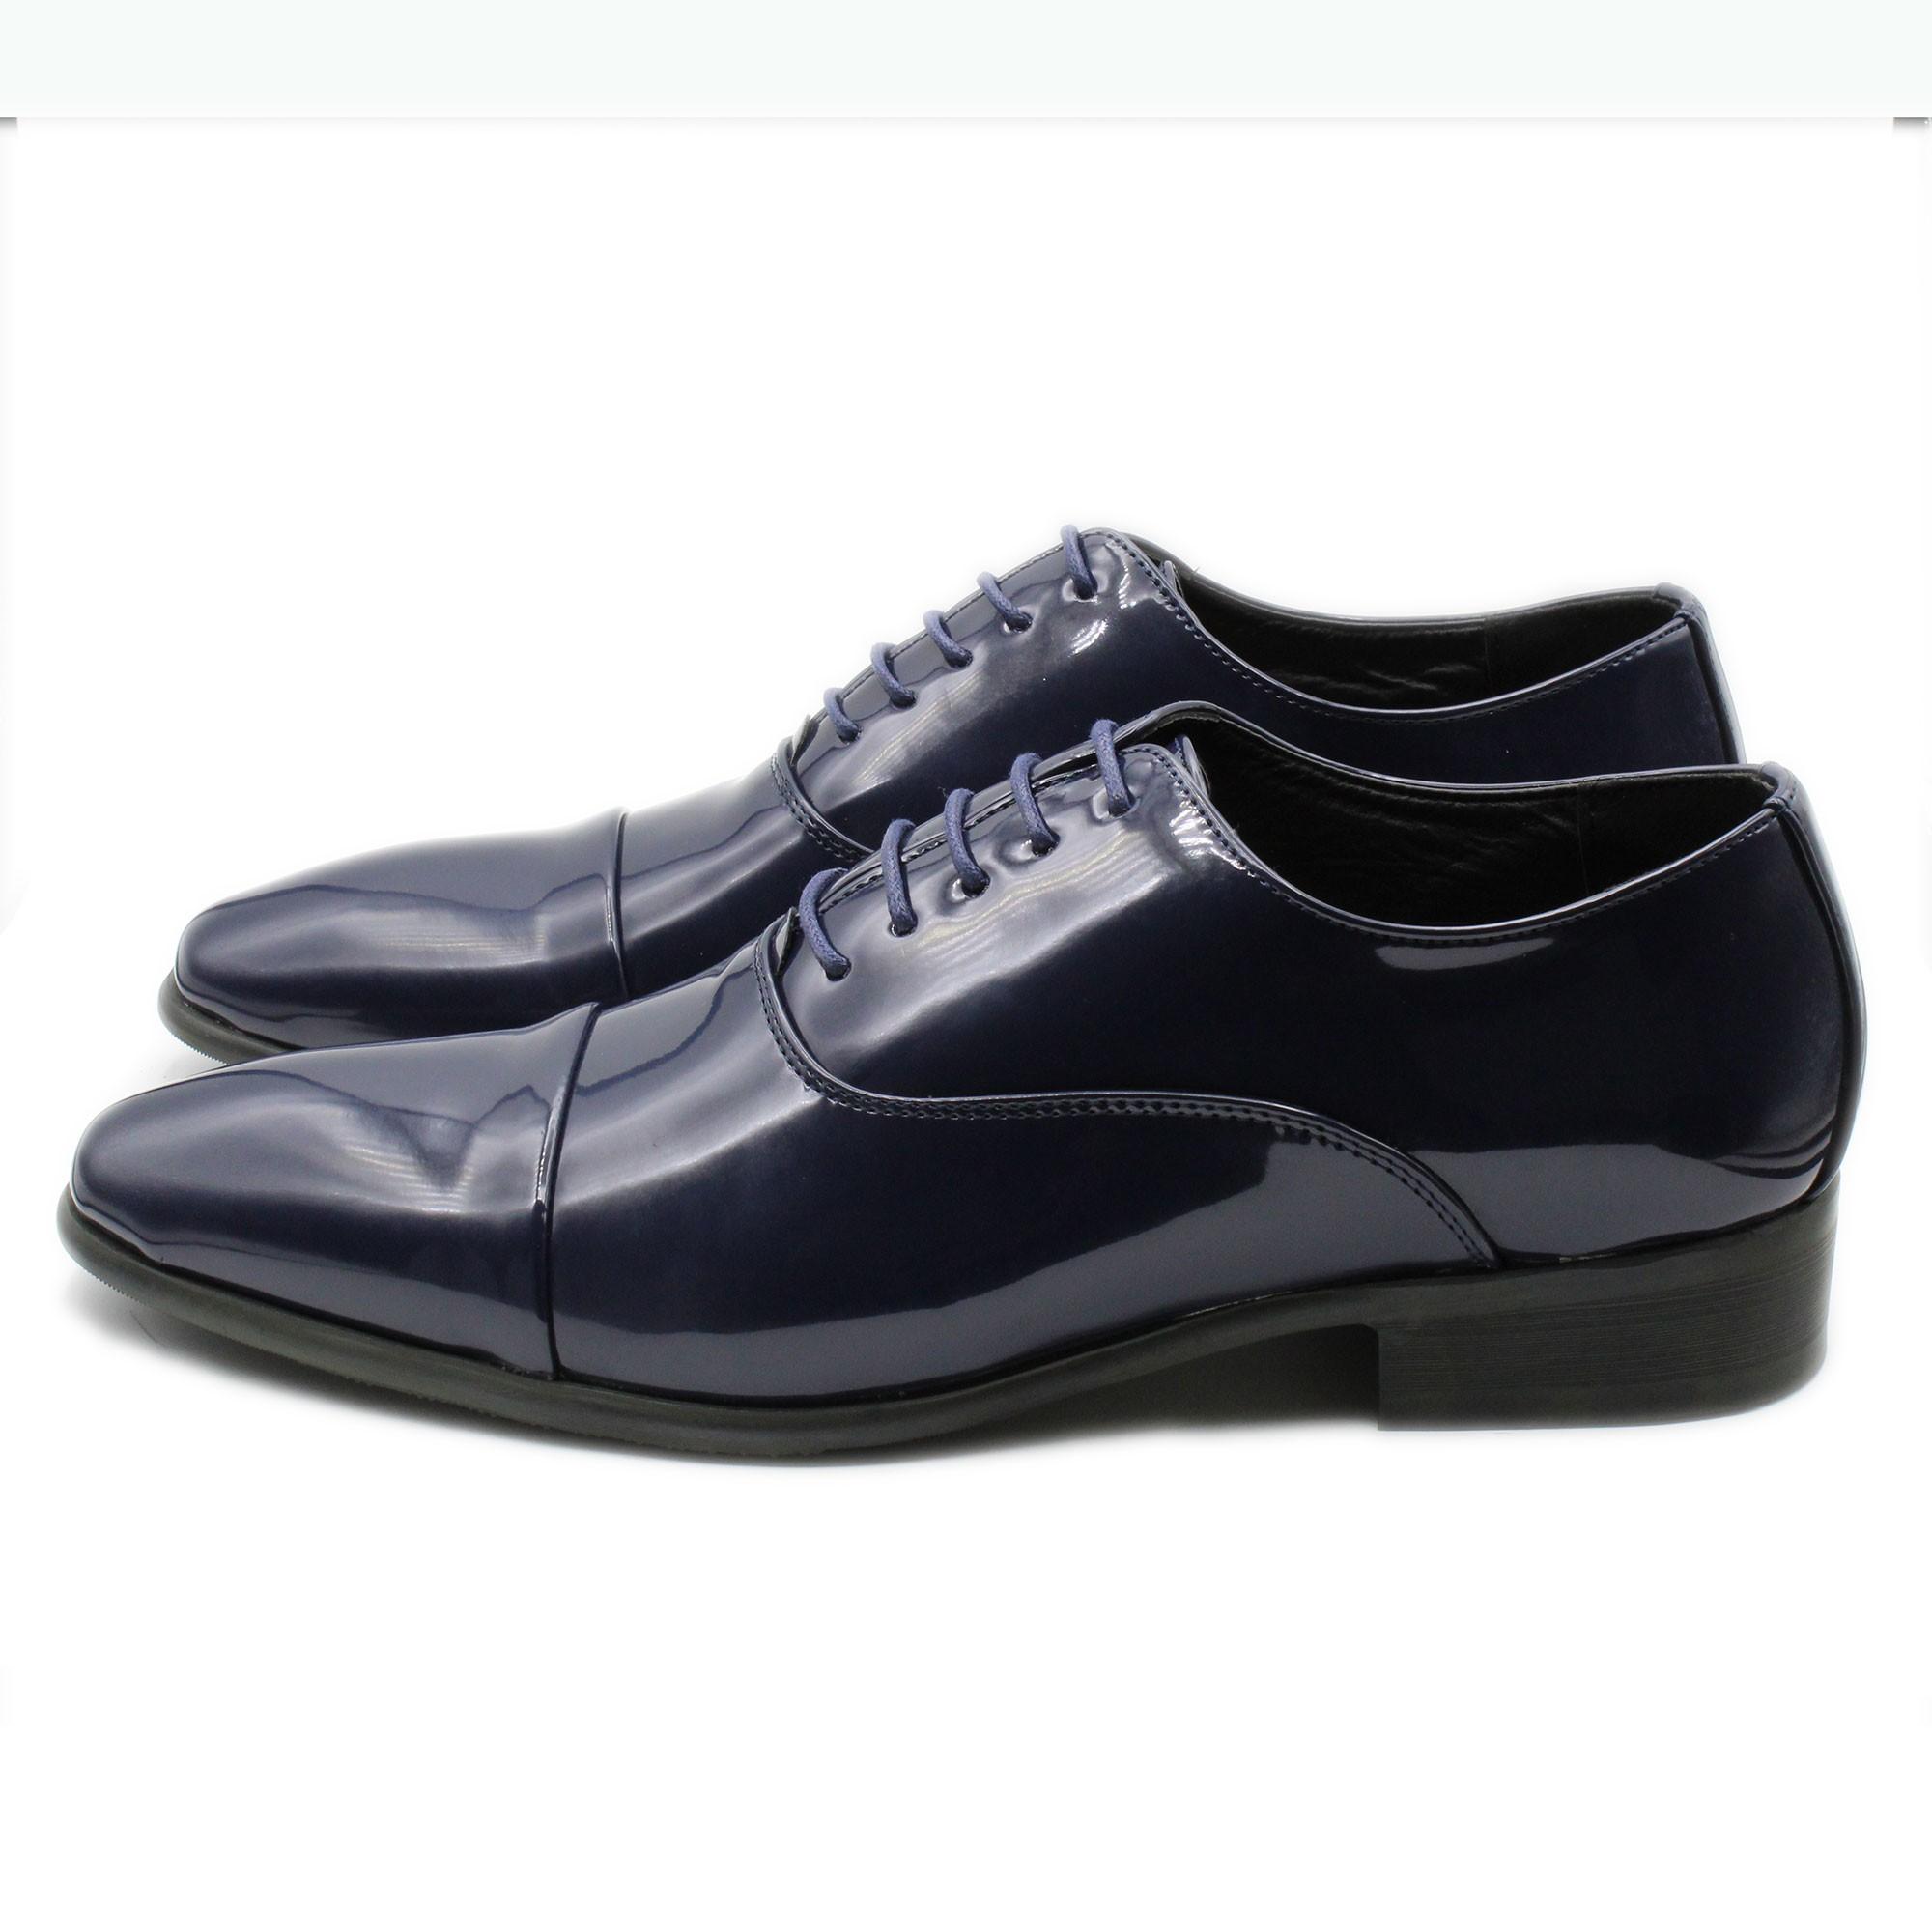 Scarpe-Uomo-Eleganti-Lucide-Blu-Nere-Francesine-Classiche-Cerimonia-Oxford miniatura 5